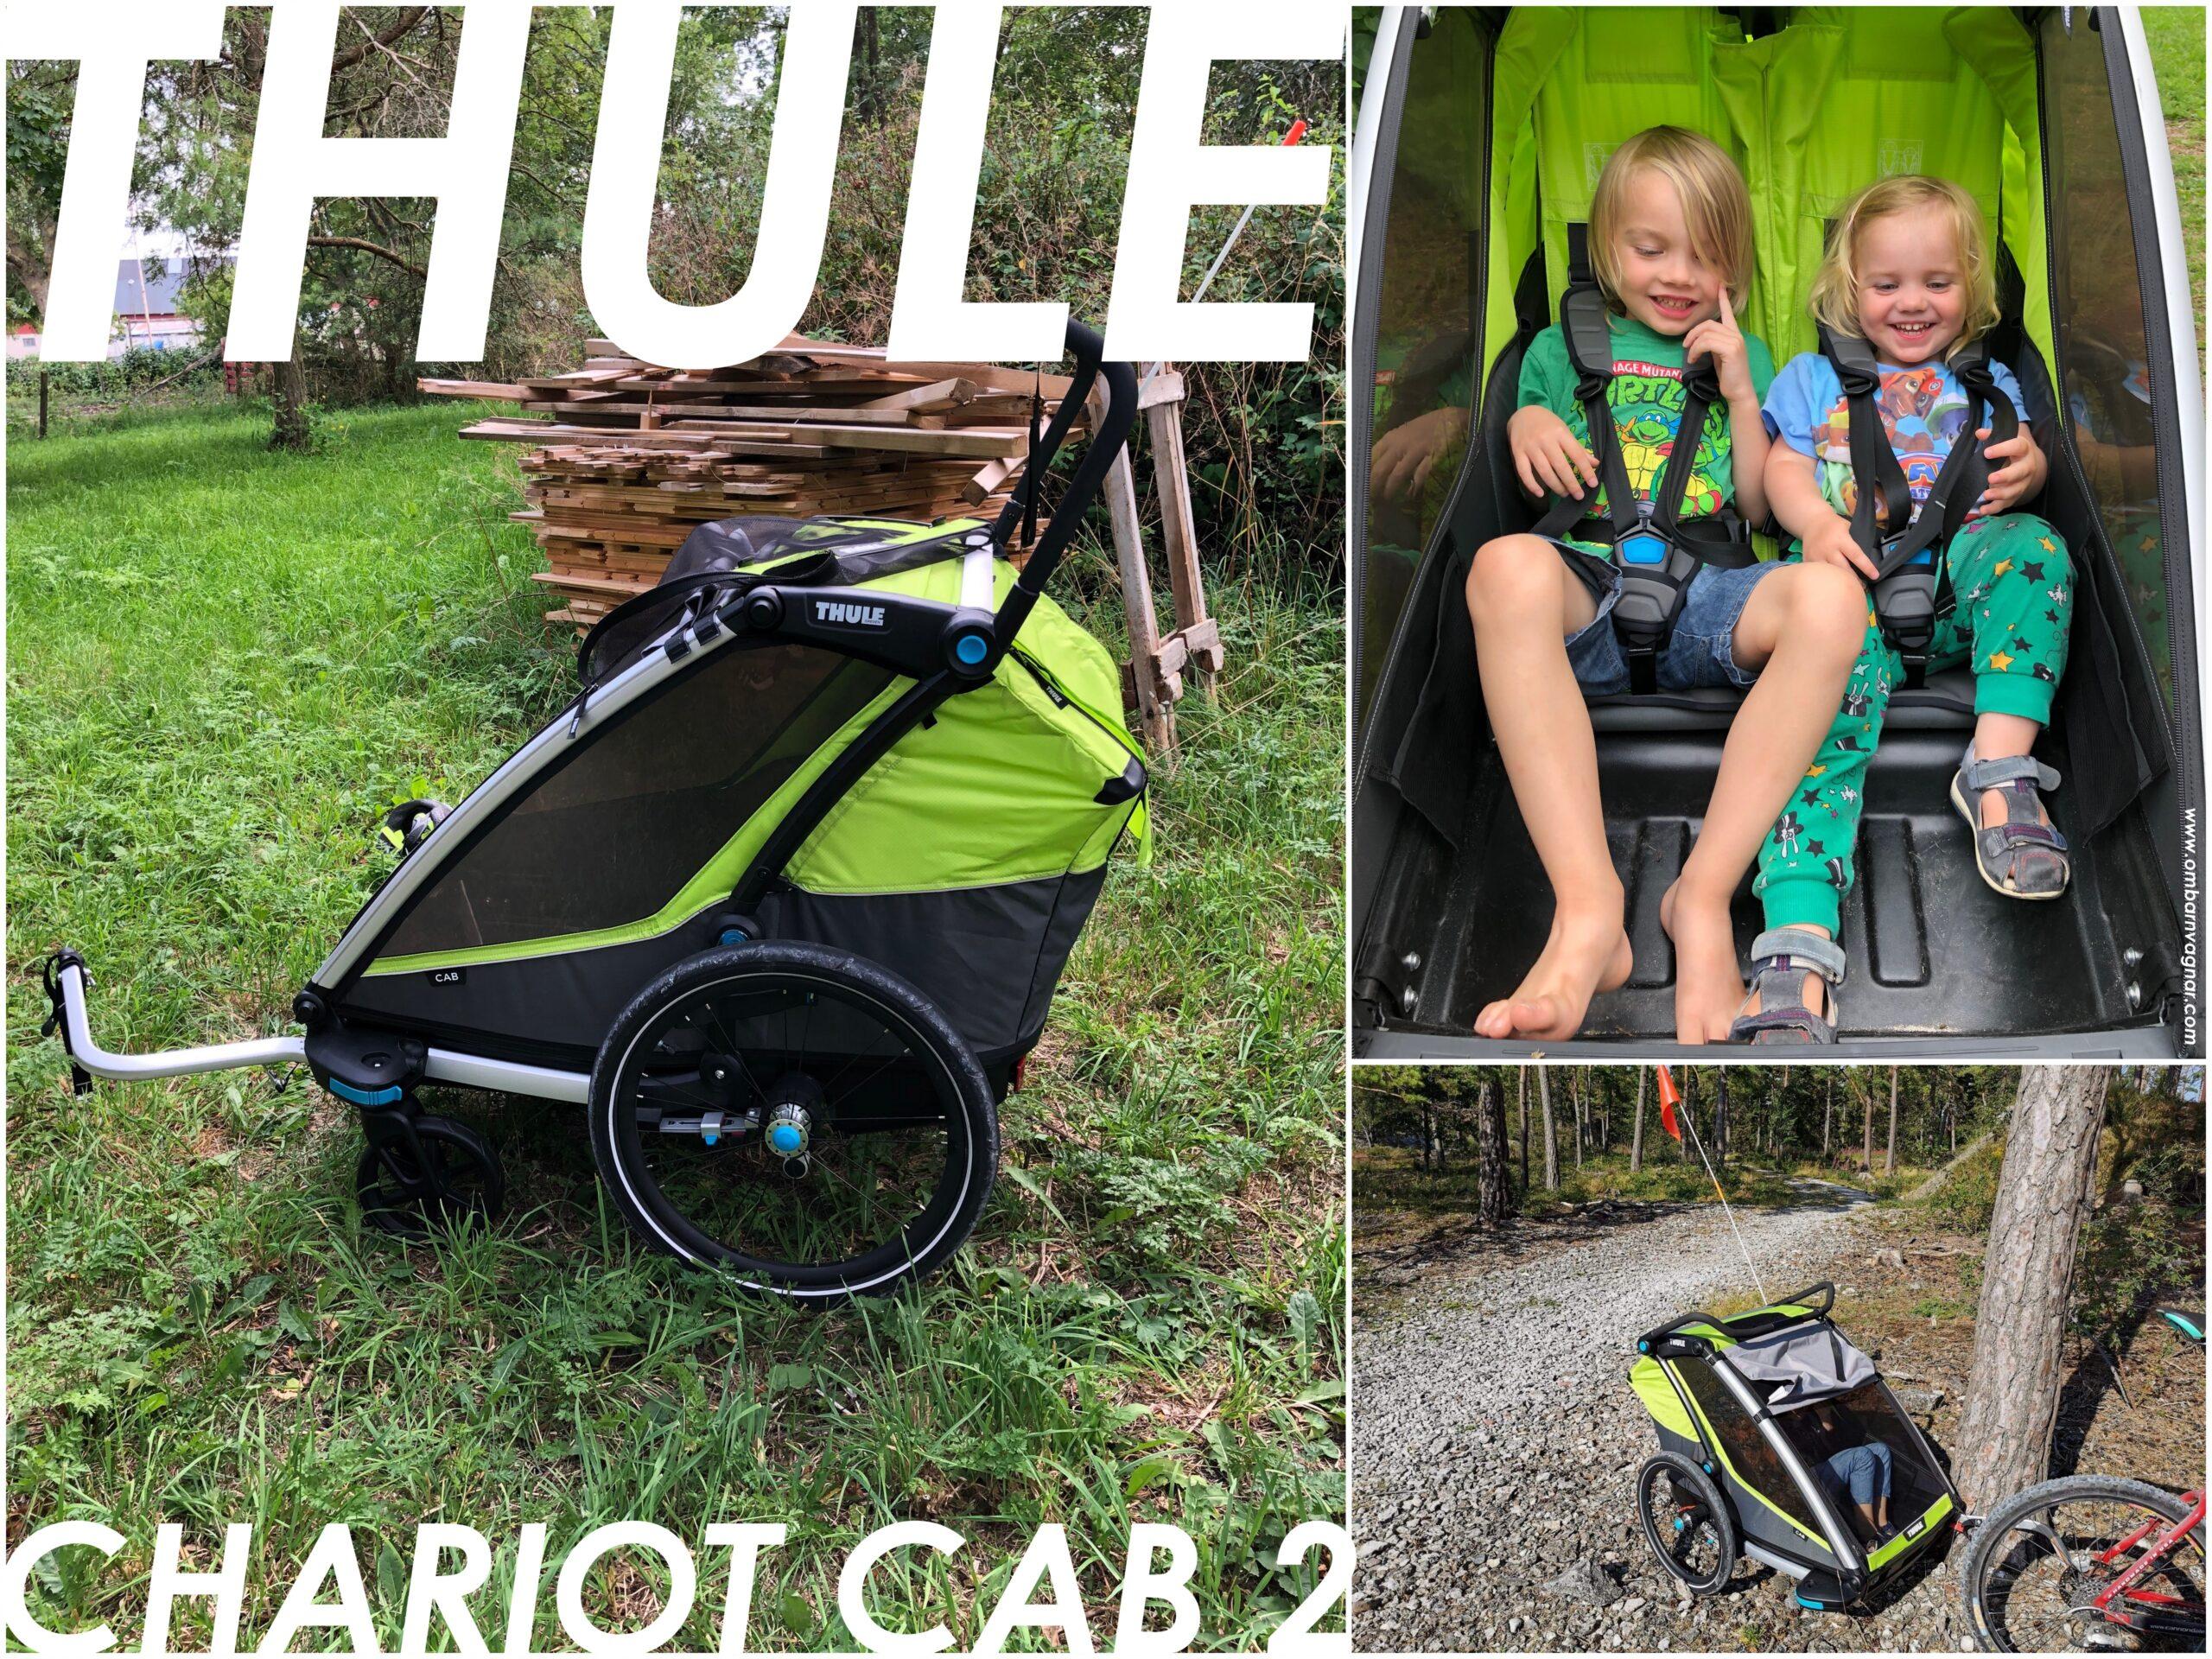 Recension av Thule Chariot Cab 2 cykelvagn